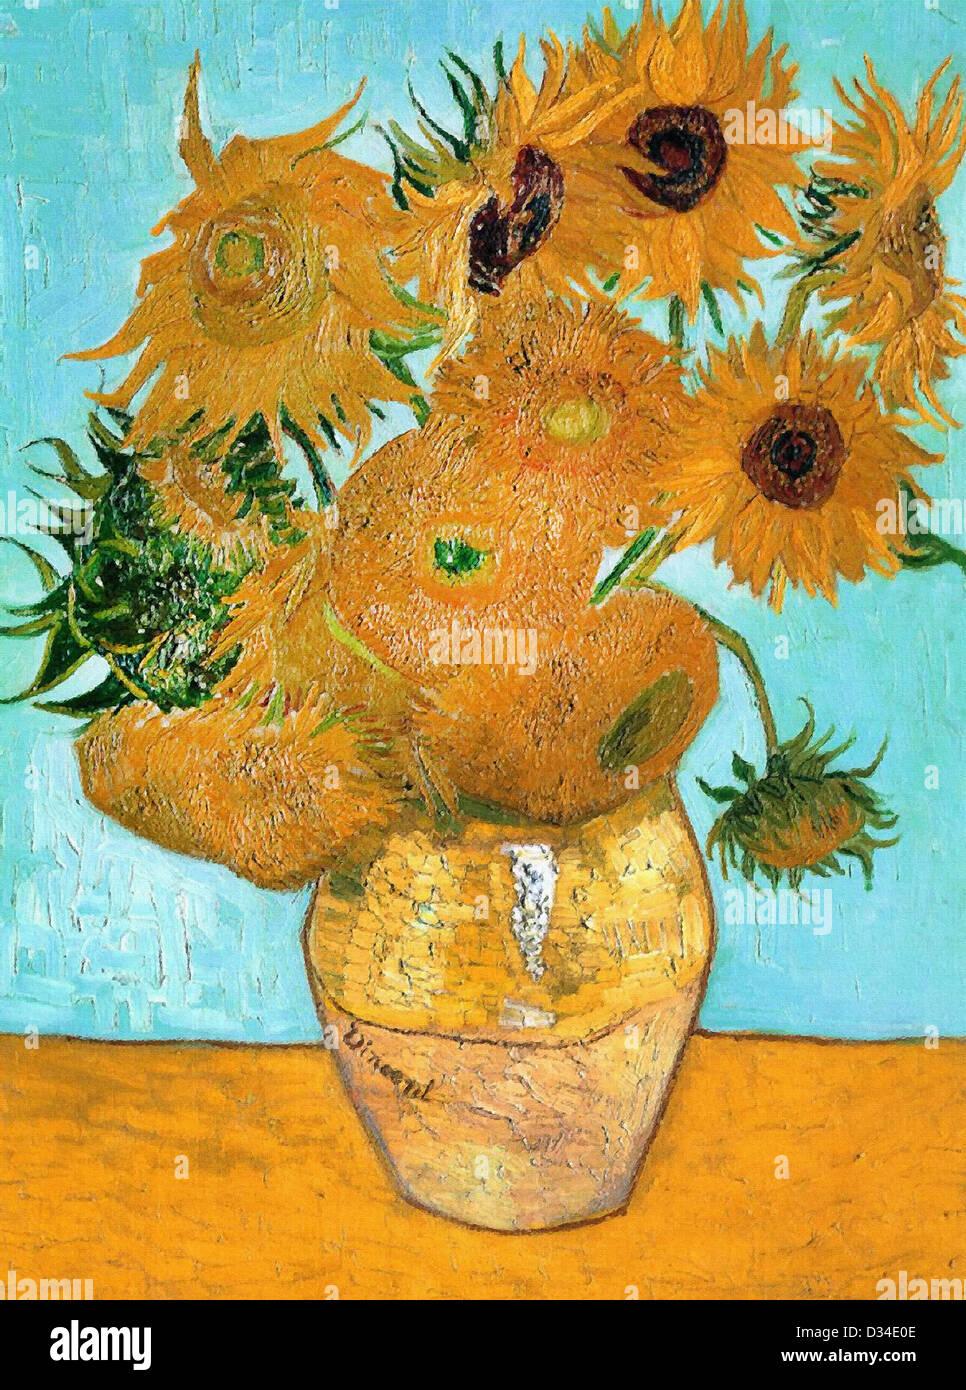 Vincent van Gogh, Still Life - Vase with Twelve Sunflowers. 1888. Post-Impressionism. Oil on canvas. - Stock Image